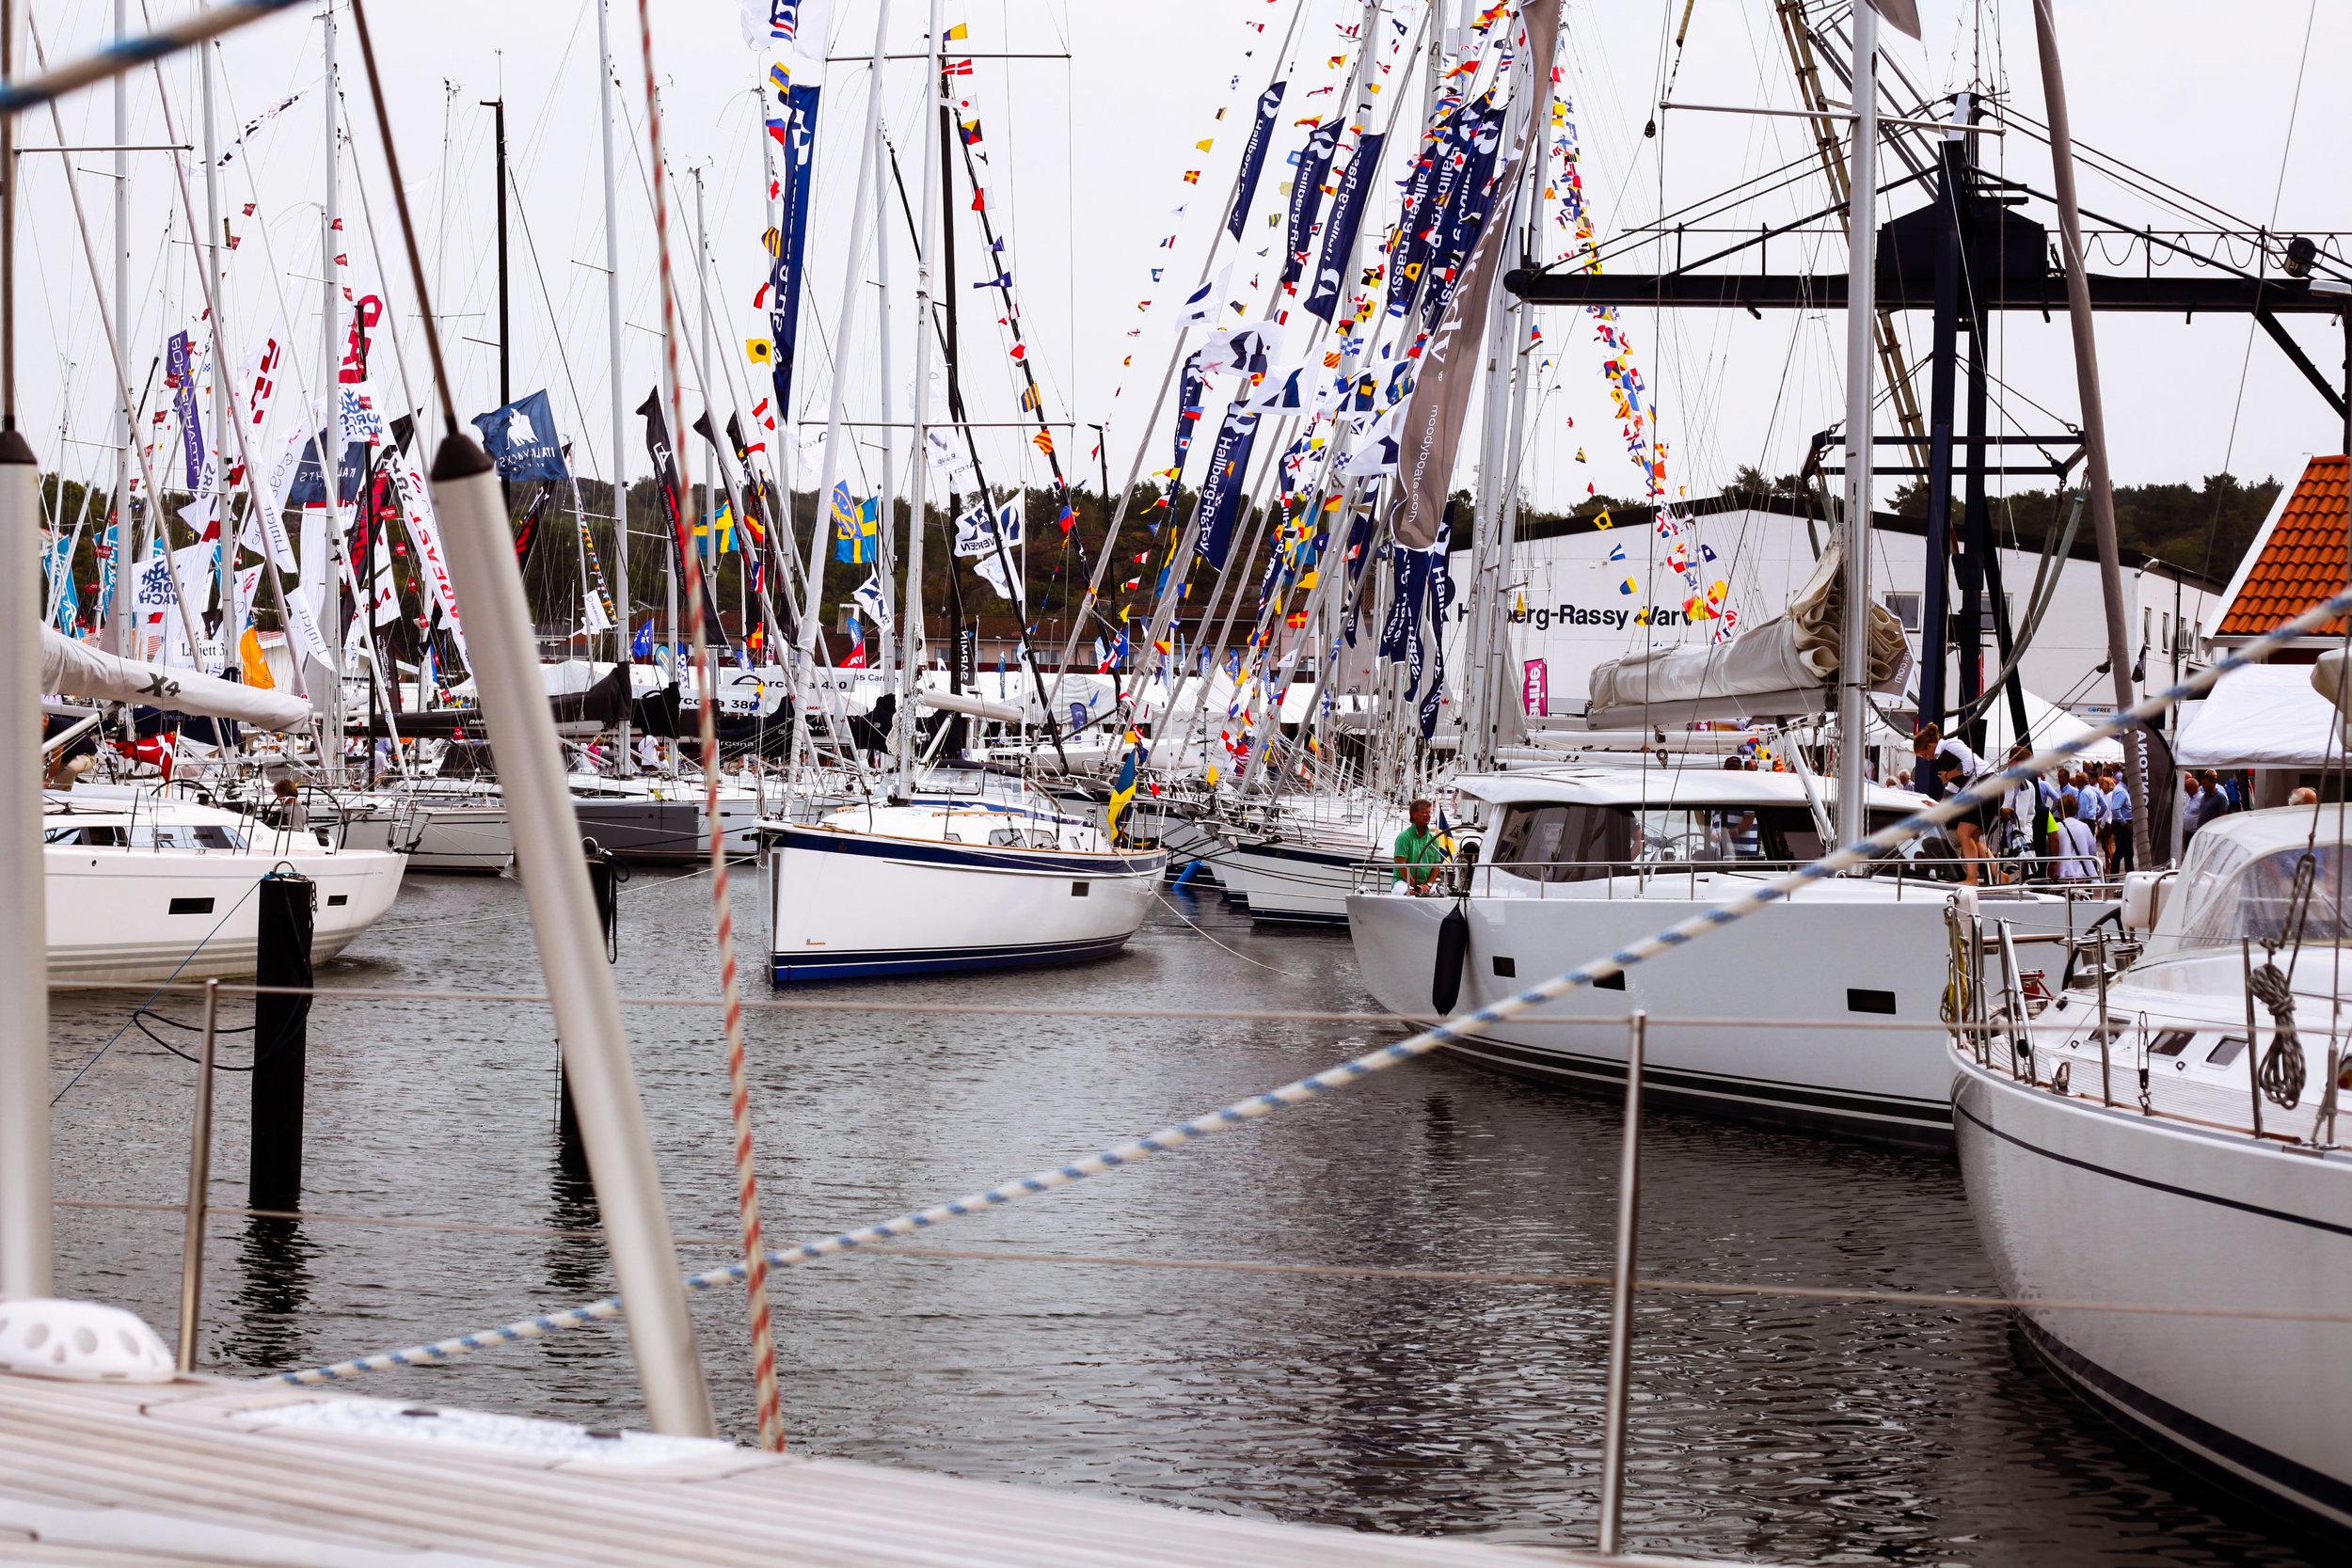 Boat Show Season 2017 - Coming Up